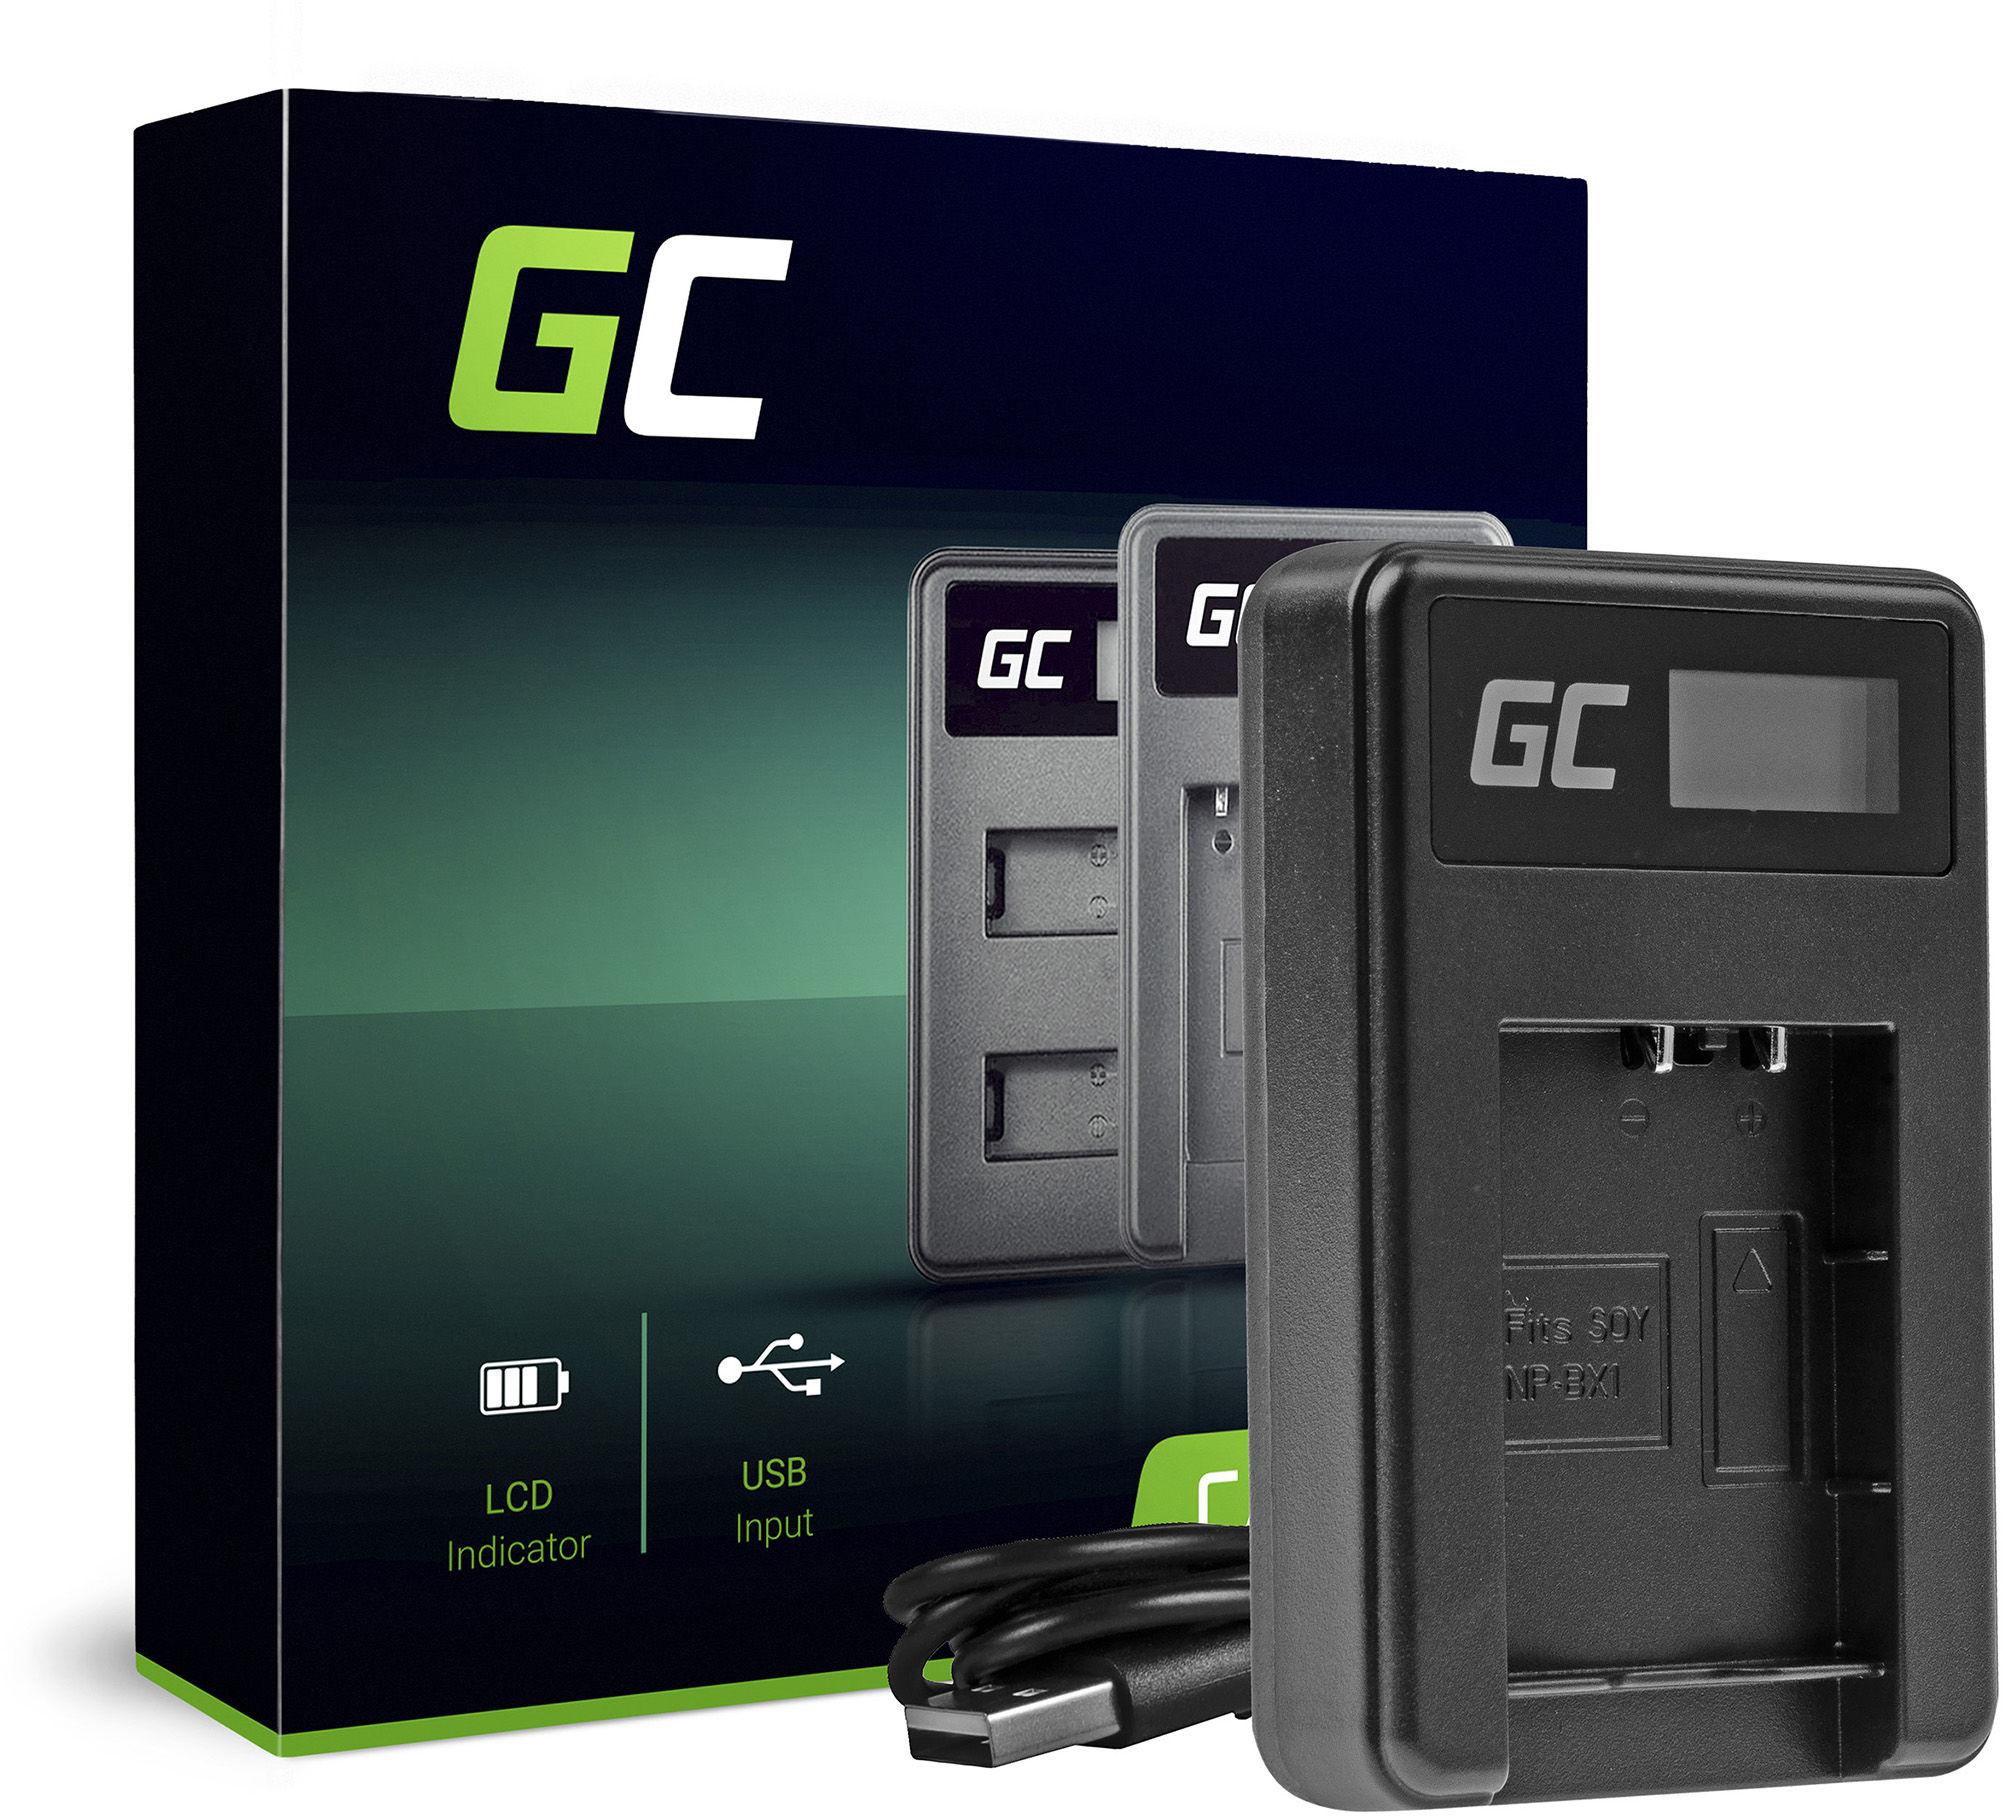 Ładowarka BC-TRX Green Cell  do Sony Action Cam NP-BX1, Cyber Shot DSC-HX50V HX300 HX400 RX100II RX100MII RX100V RX100V AS15